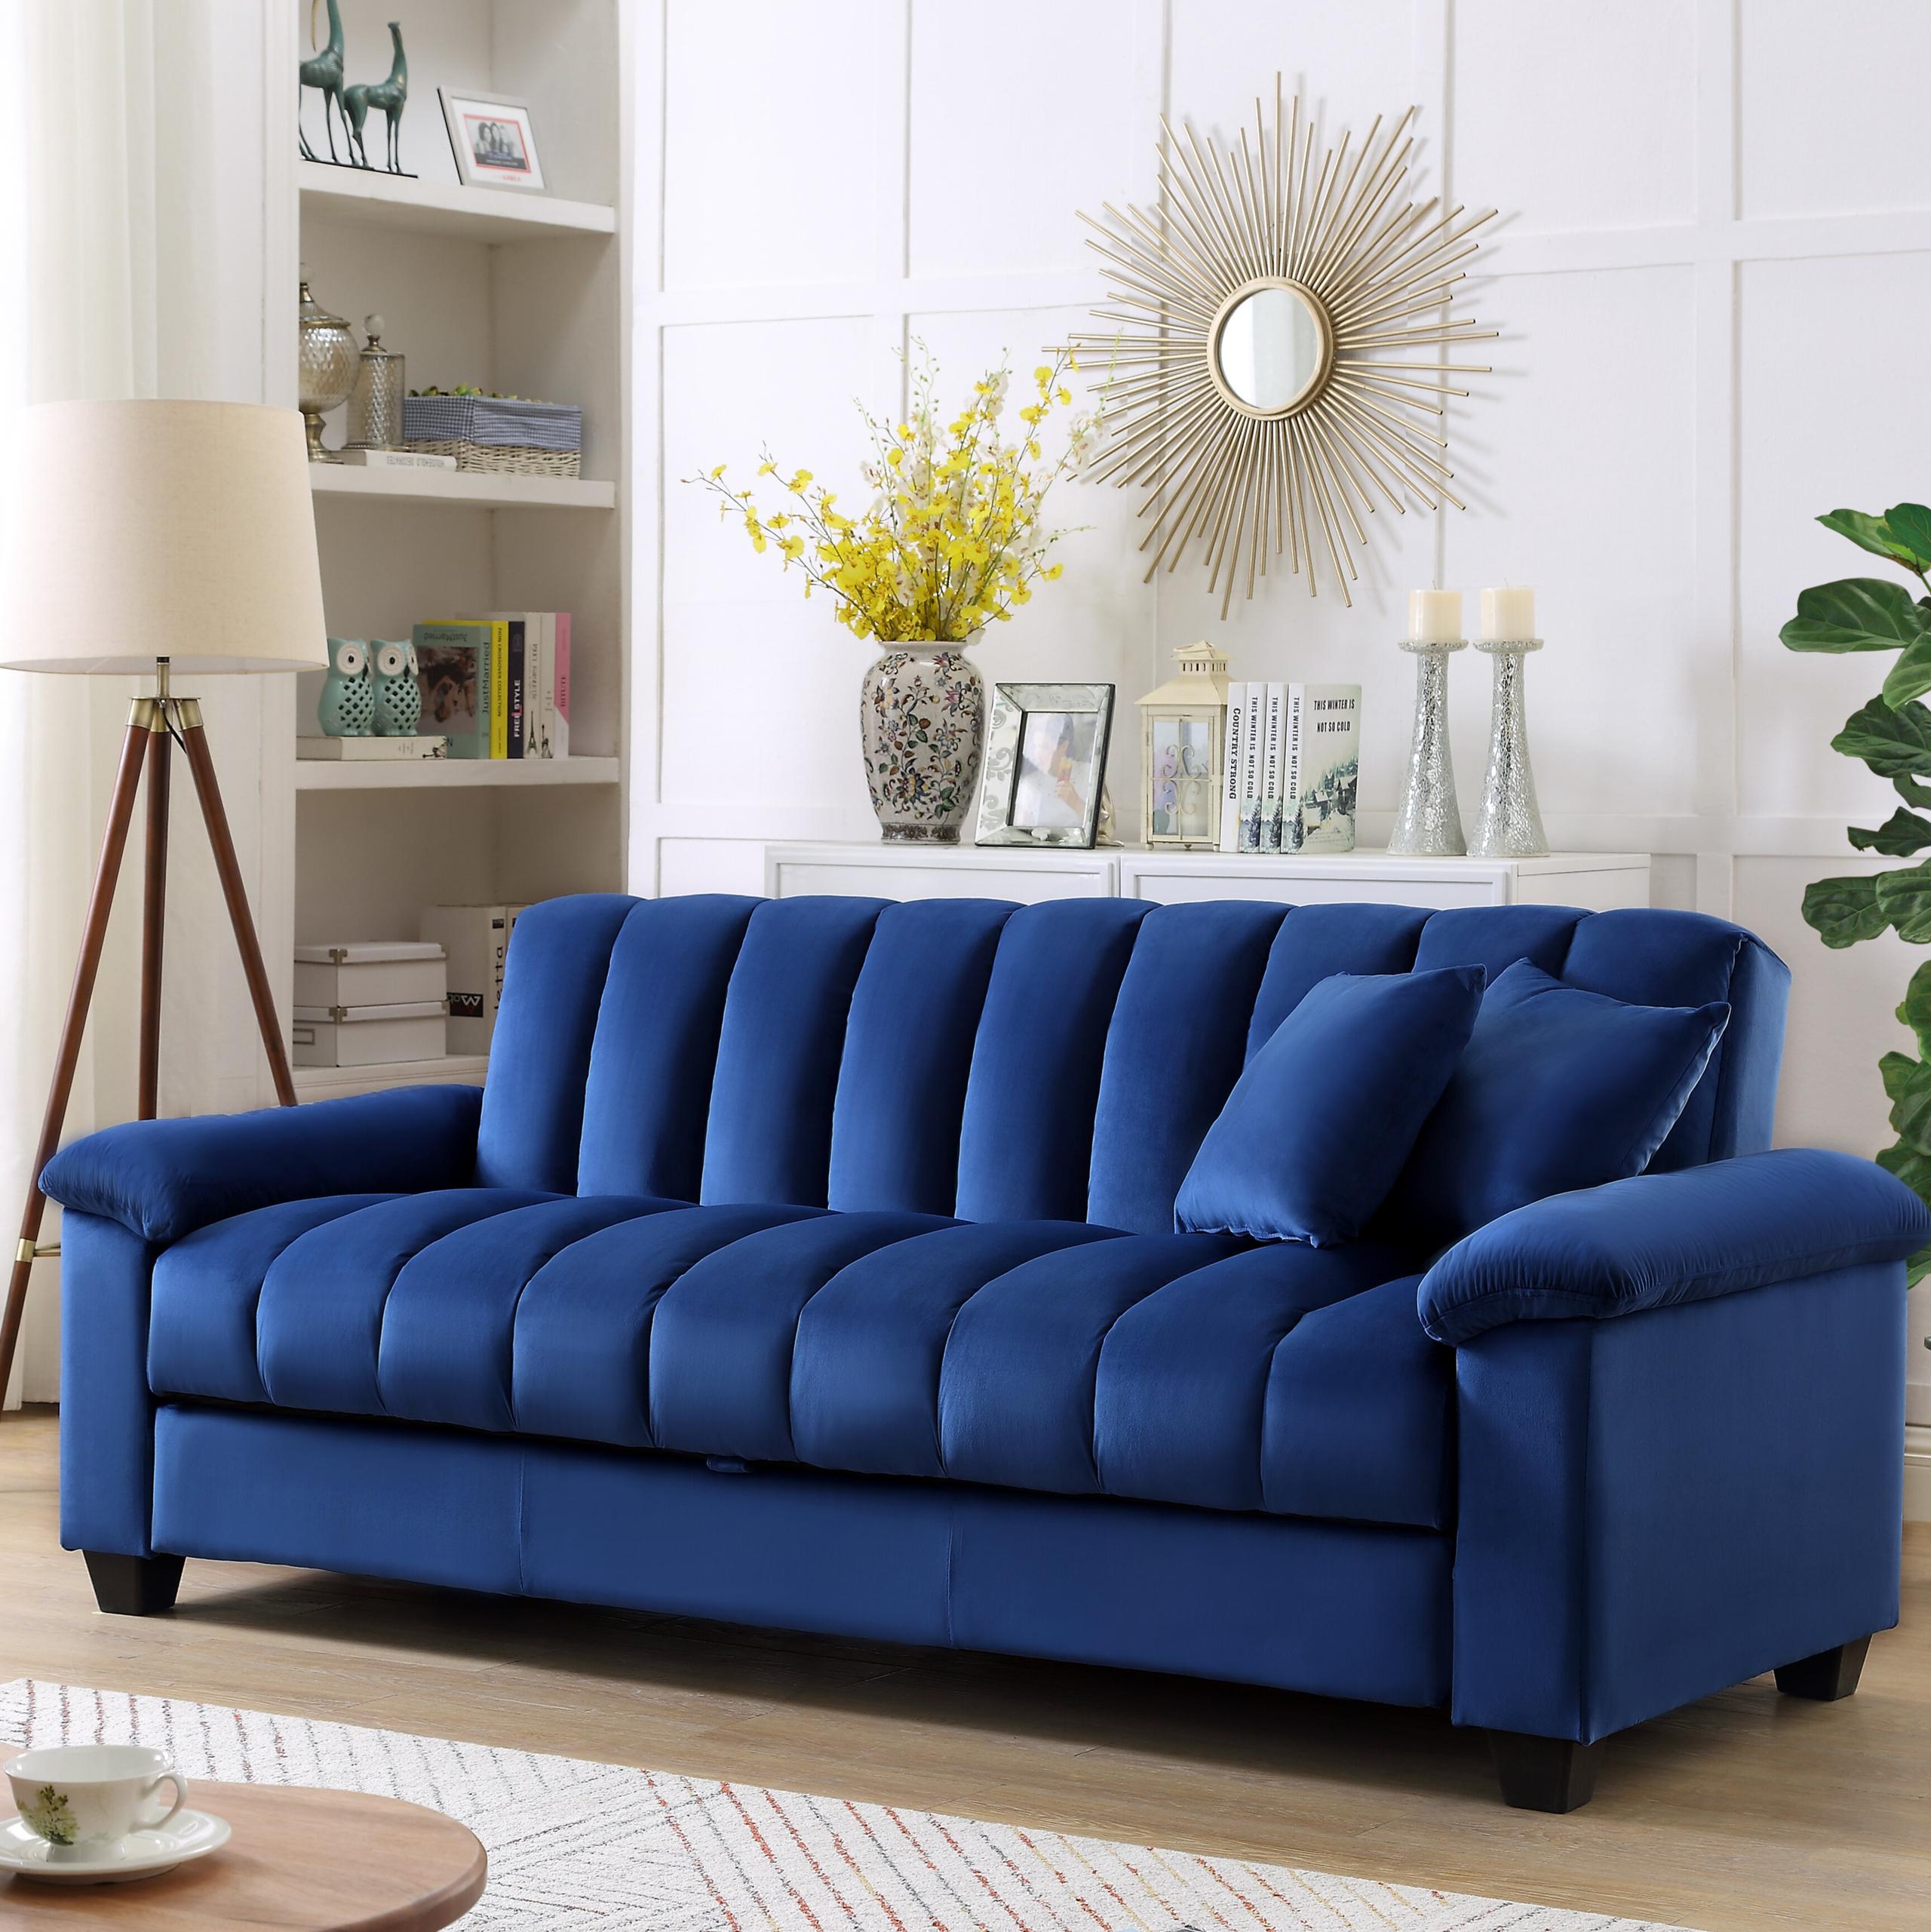 extra long sofa ideas on foter